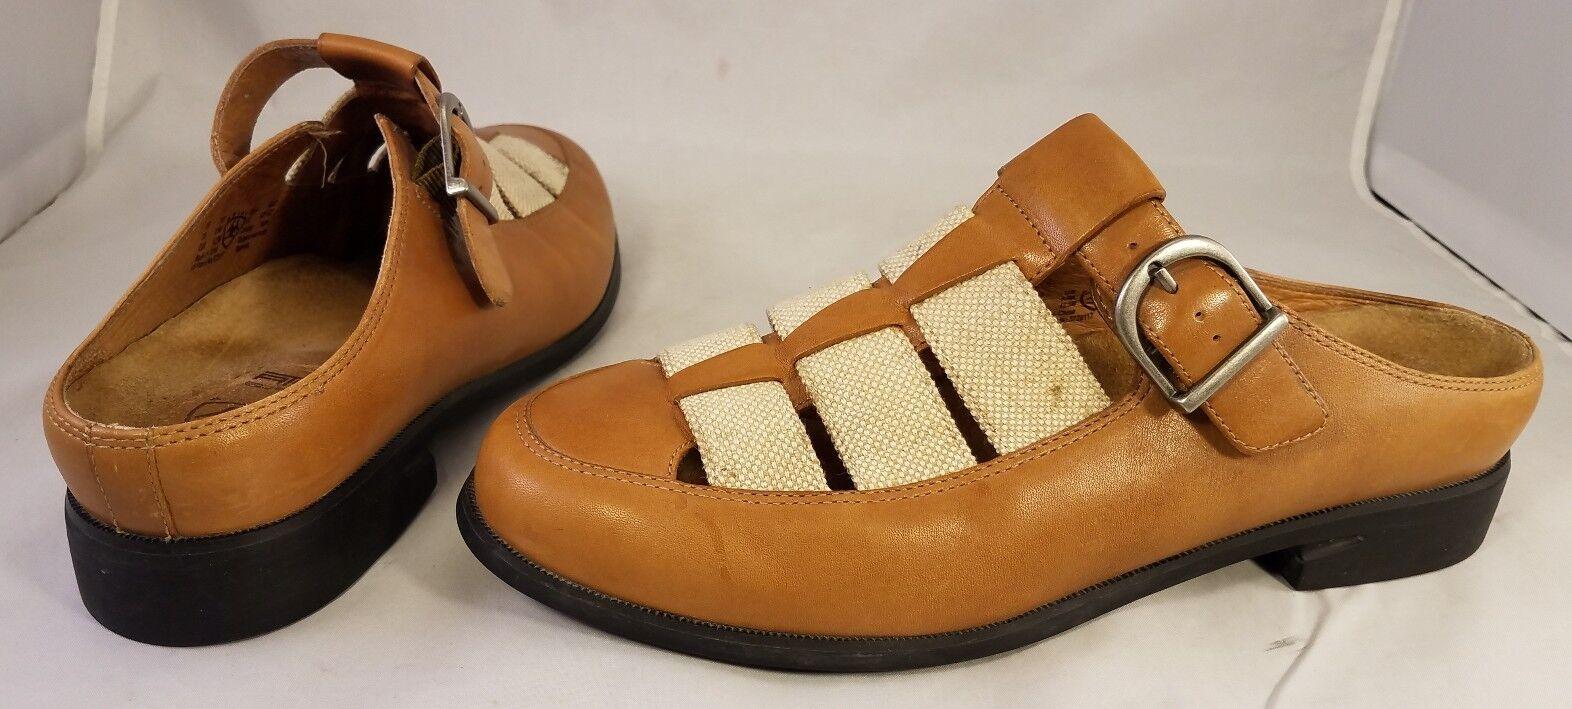 RARE ARIAT Schuhe Damenschuhe Schuhe ARIAT CLOGS MULES WOVEN TAN BEIGE SIZE US 11/ EUR 42.5 ea68c4